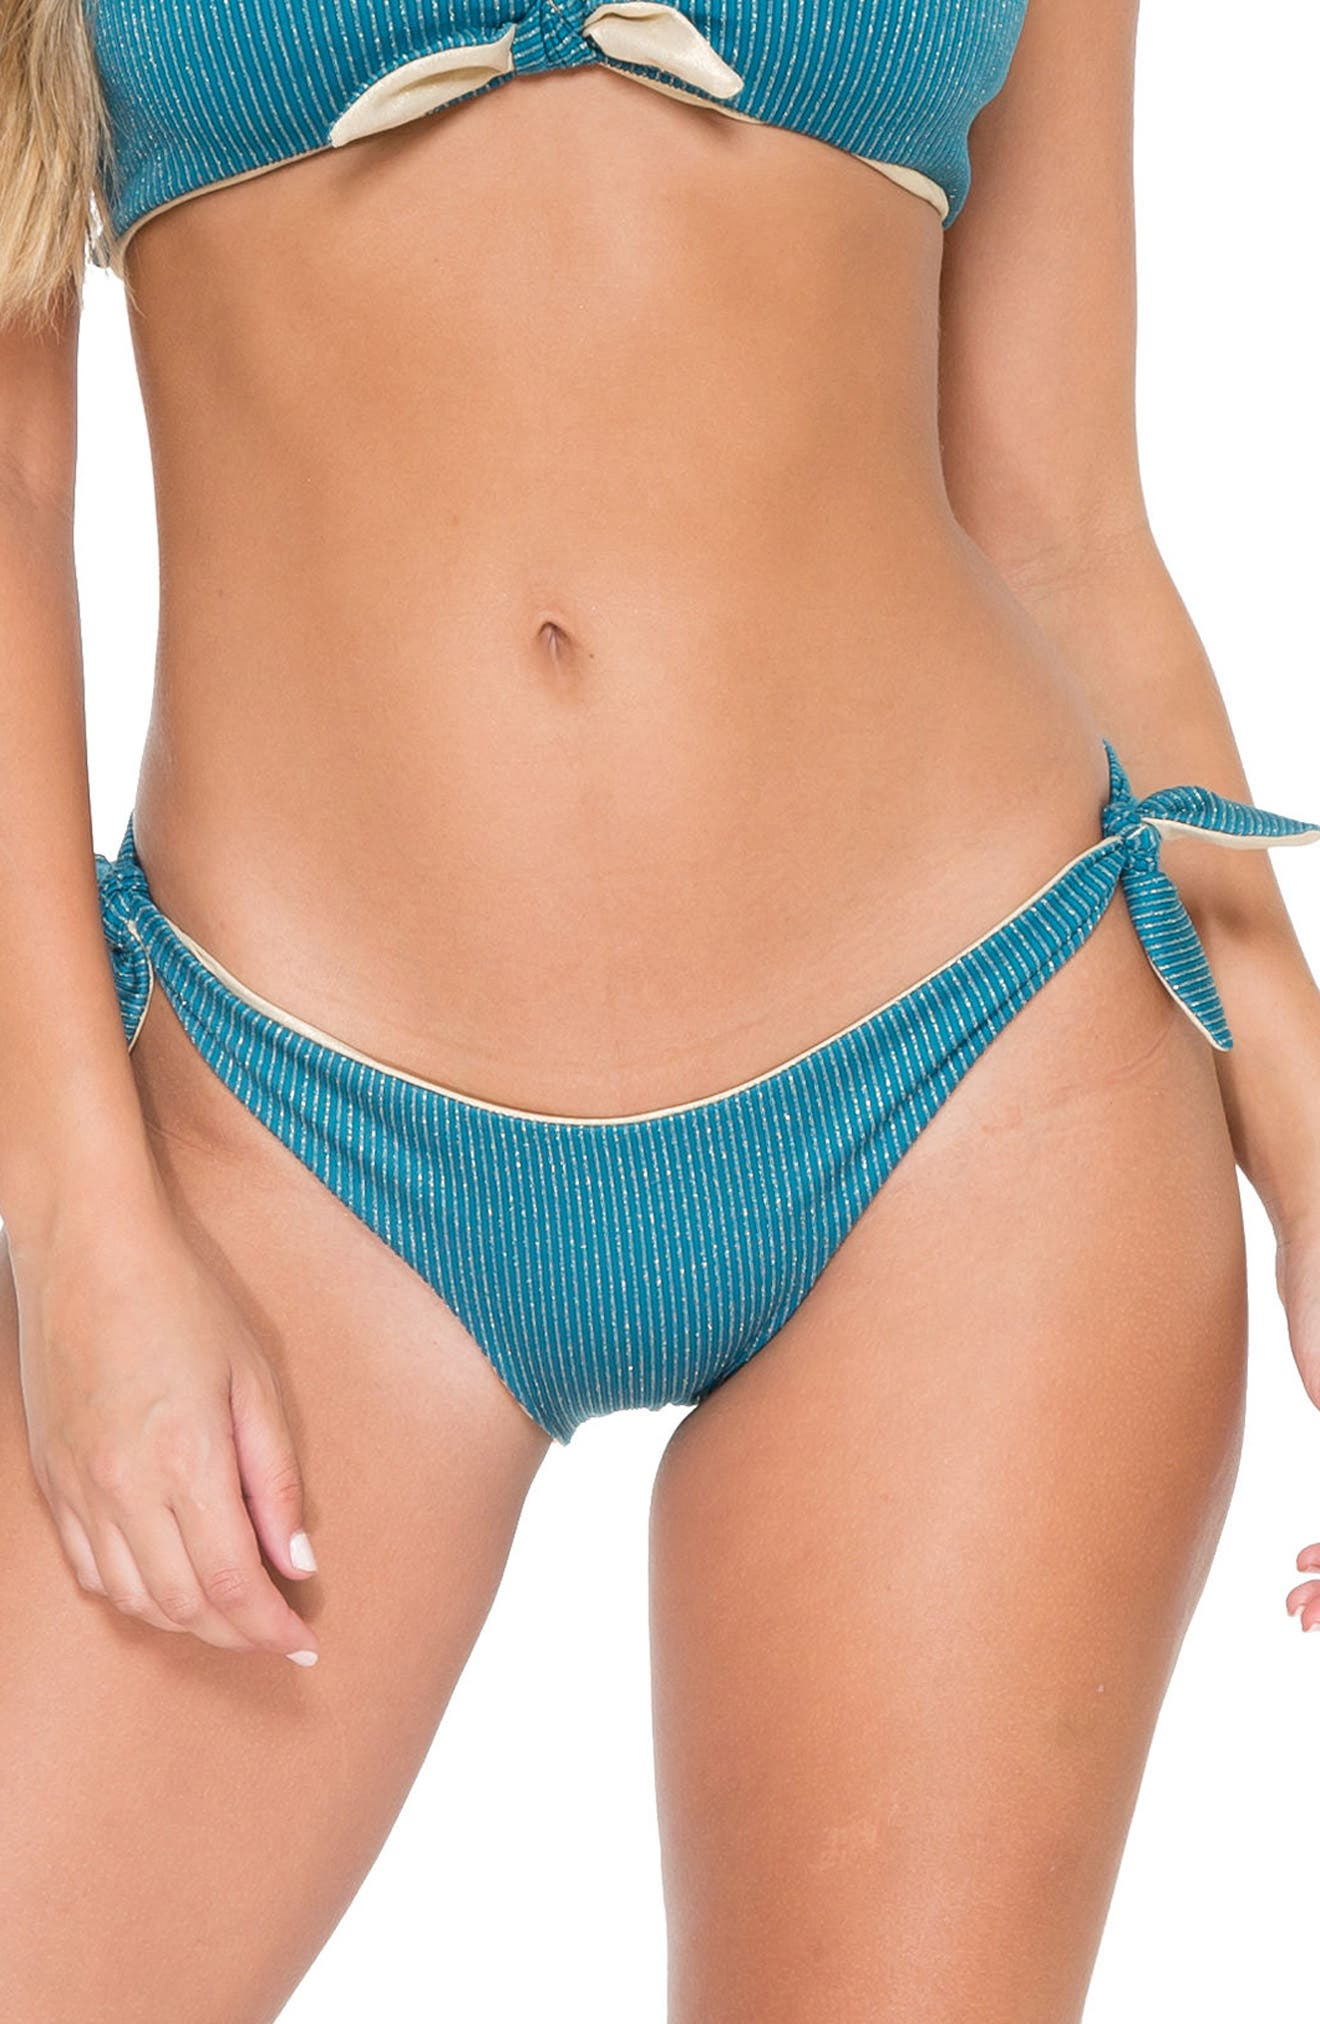 Main Image - Luli Fama Cayo Hueso Reversible Bikini Bottoms